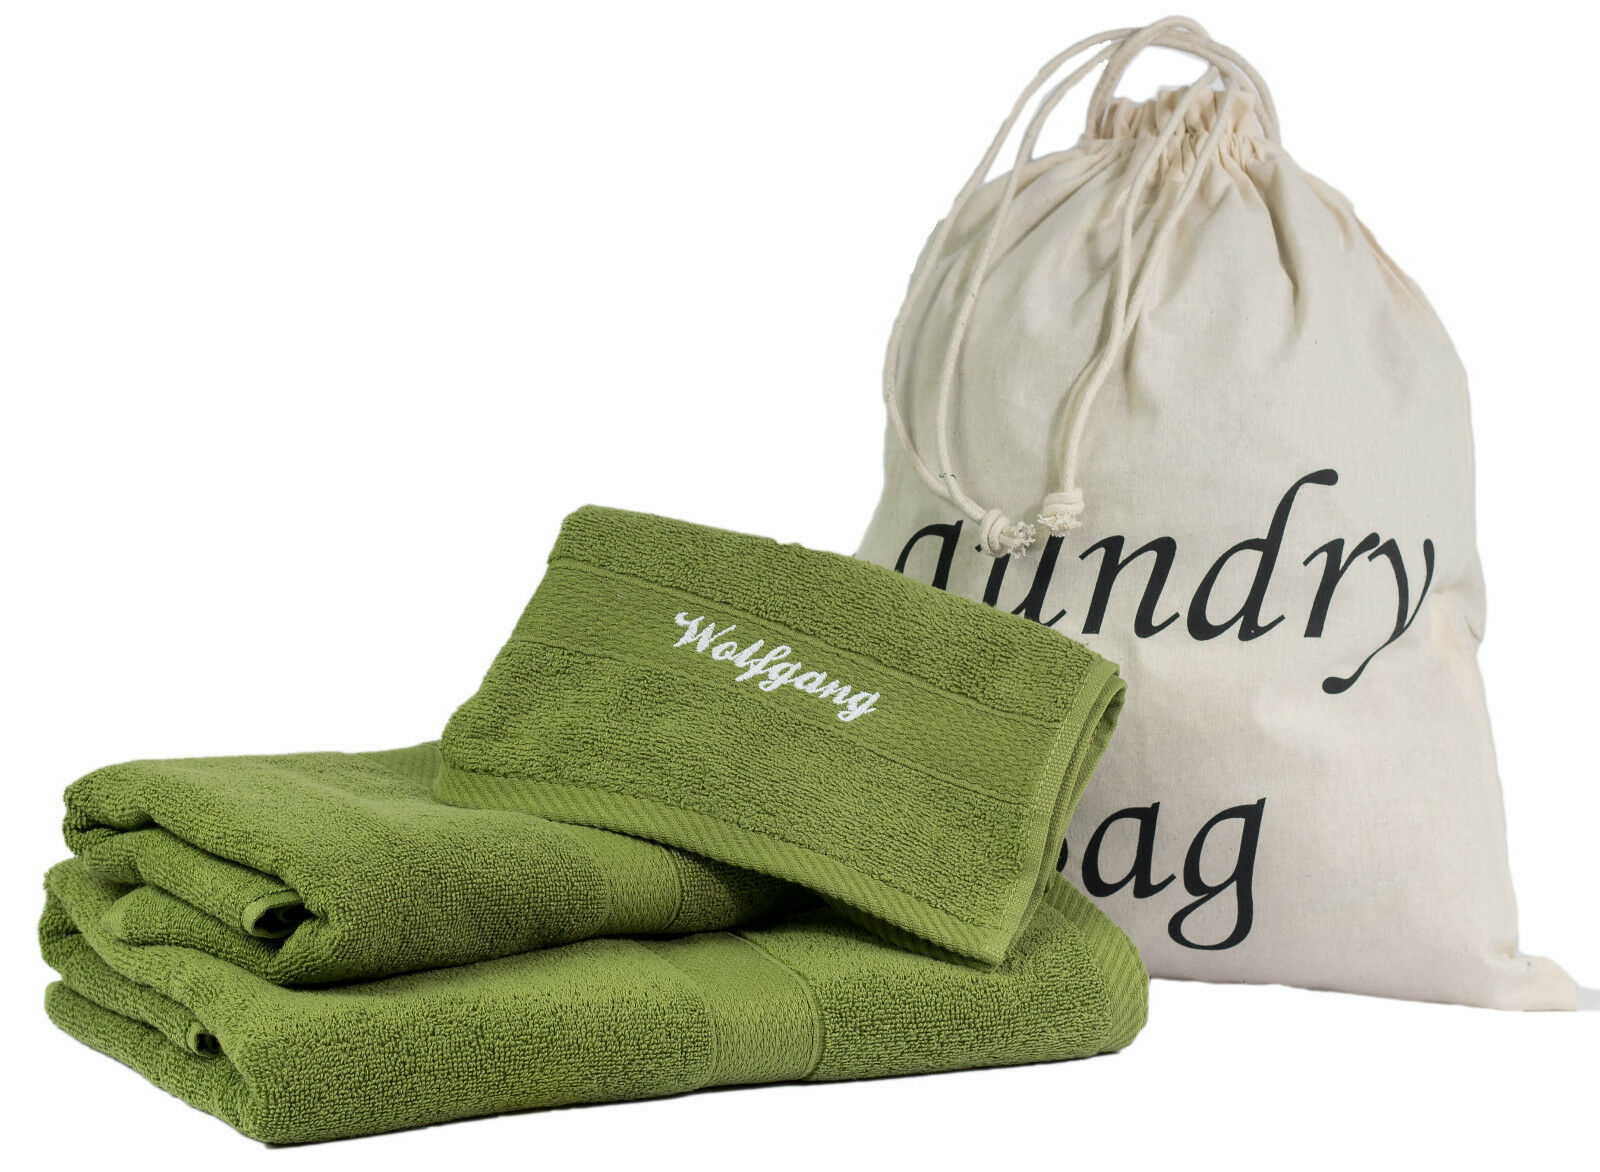 4 tlgSet Handtuch Duschtuch Gästetuch Wäsche-Bag mit Wunschnamen cypress 100% BW     | Offizielle